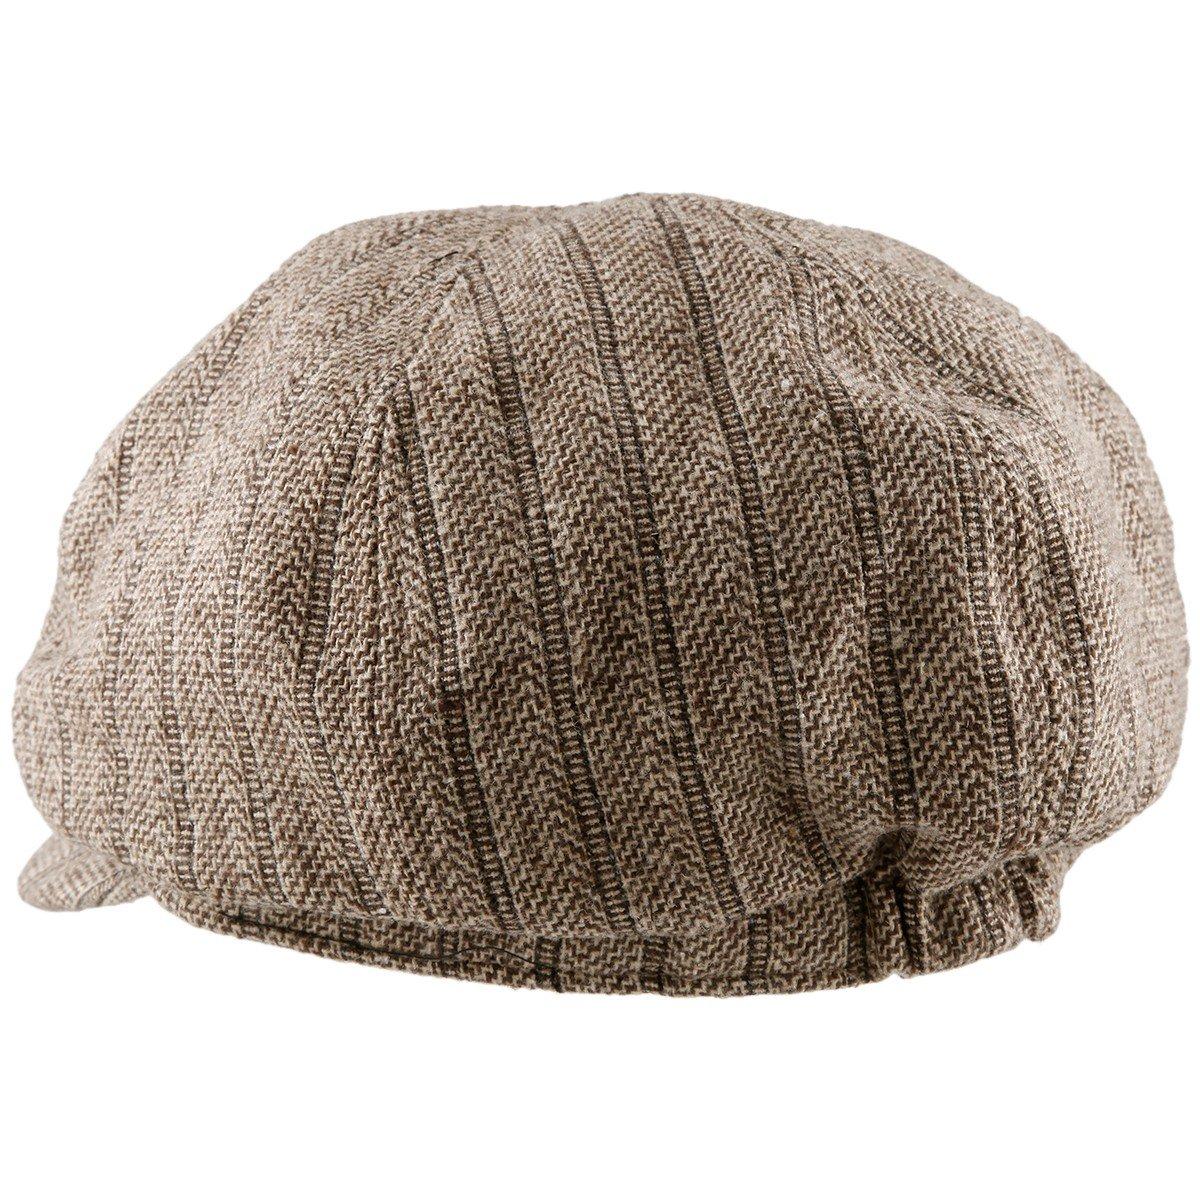 Moonsix Newsboys Hats,Unisex Winter Berets Hat Woolen Cotton Cabbie Cap 3